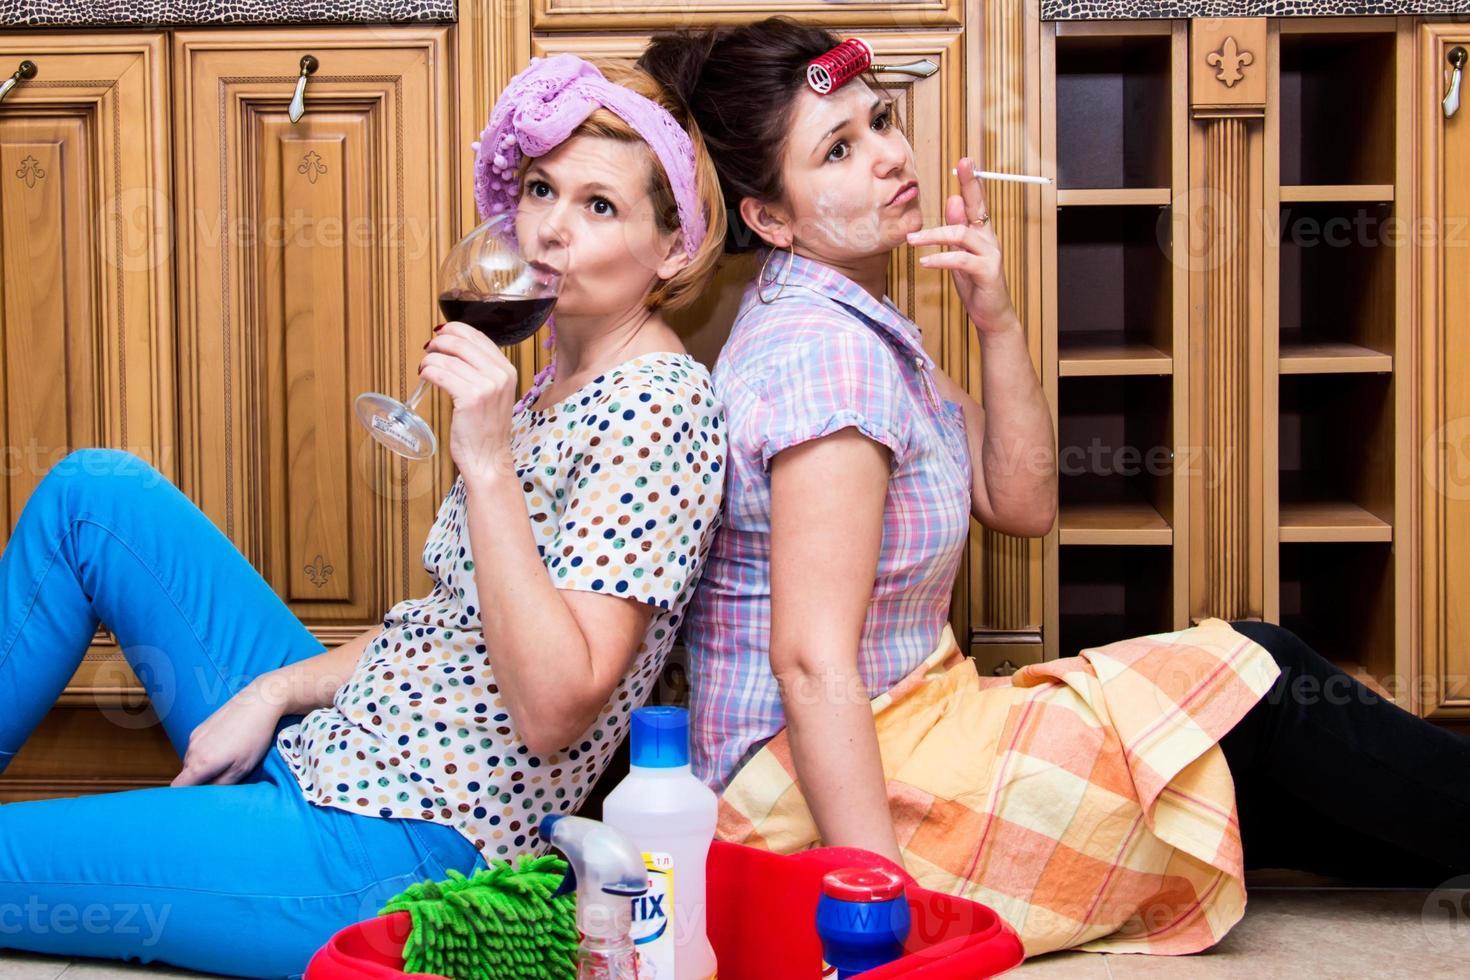 due casalinga stanca che beve vino foto